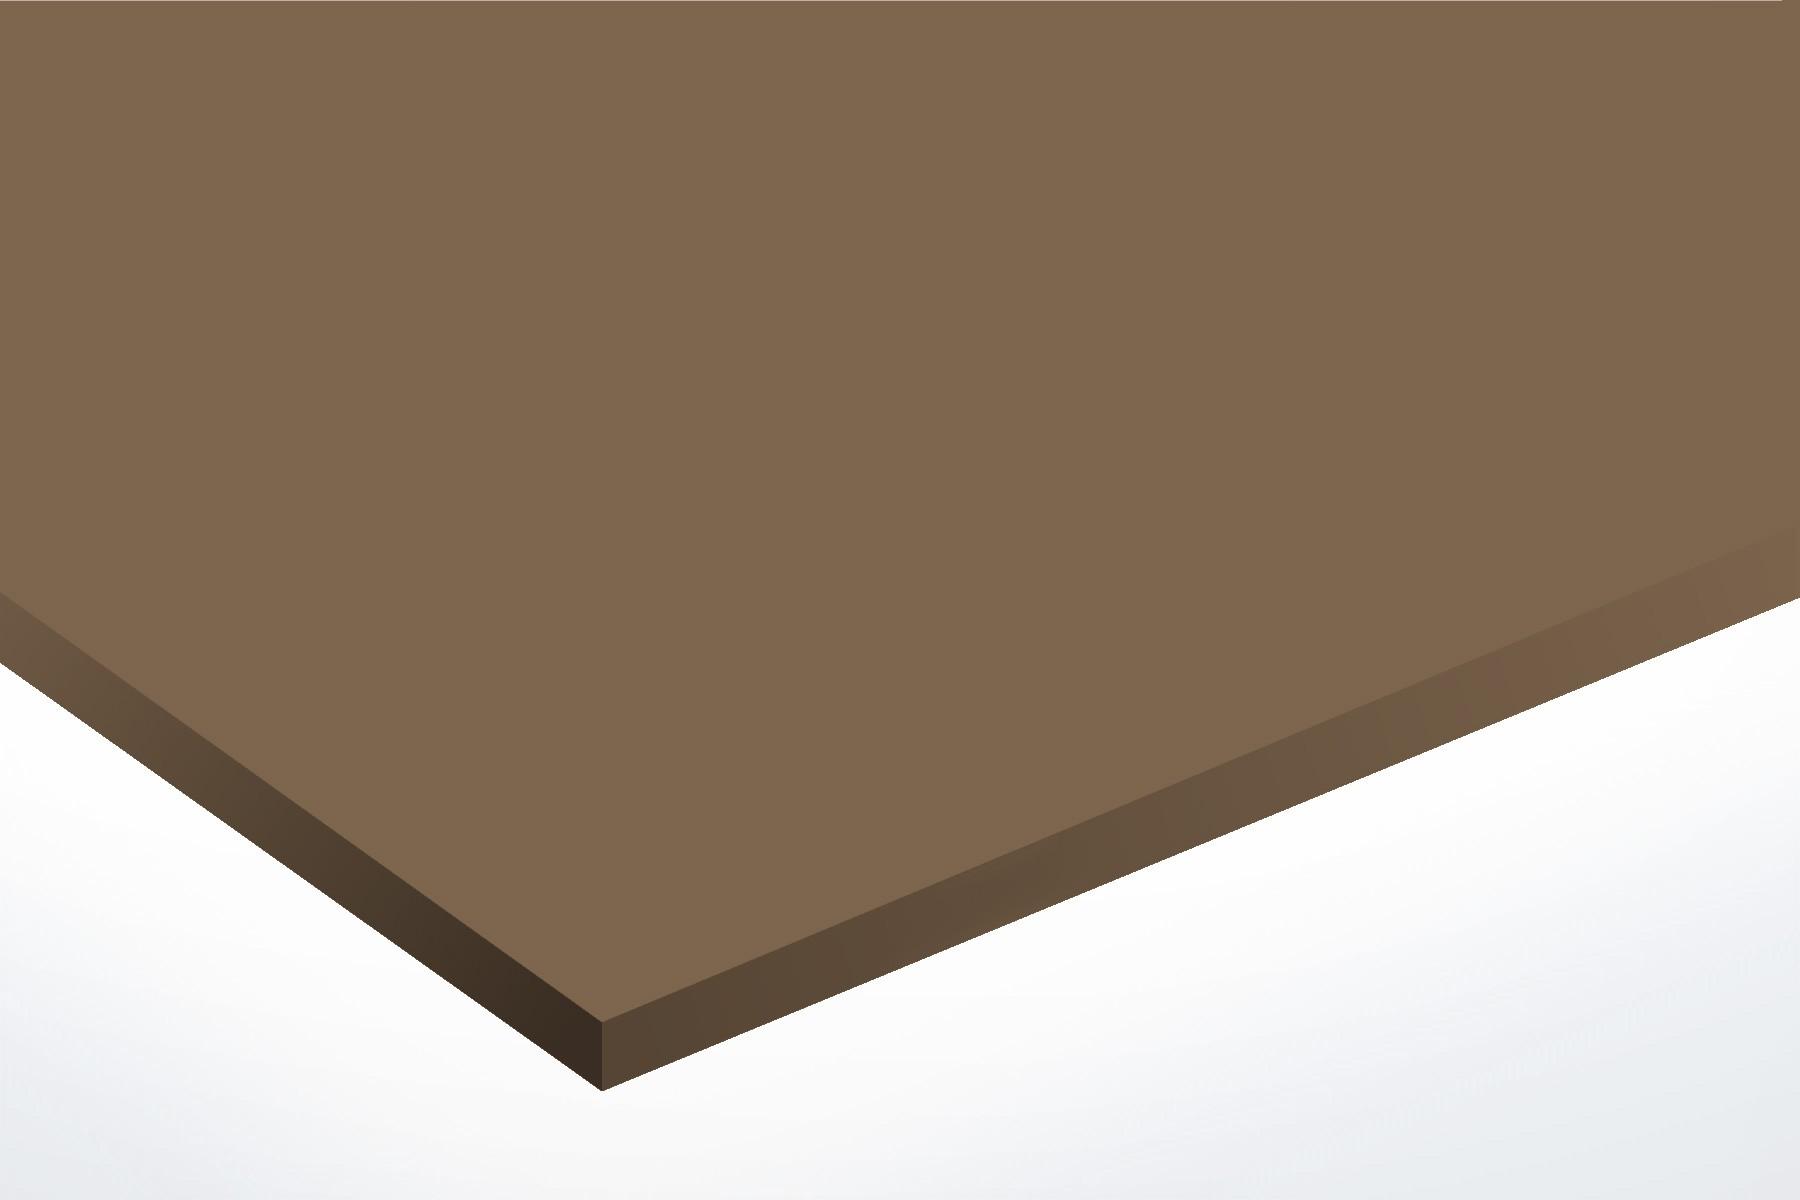 Anodised Aluminium Bronze, Matte, 2mm x 1000mm x 500mm